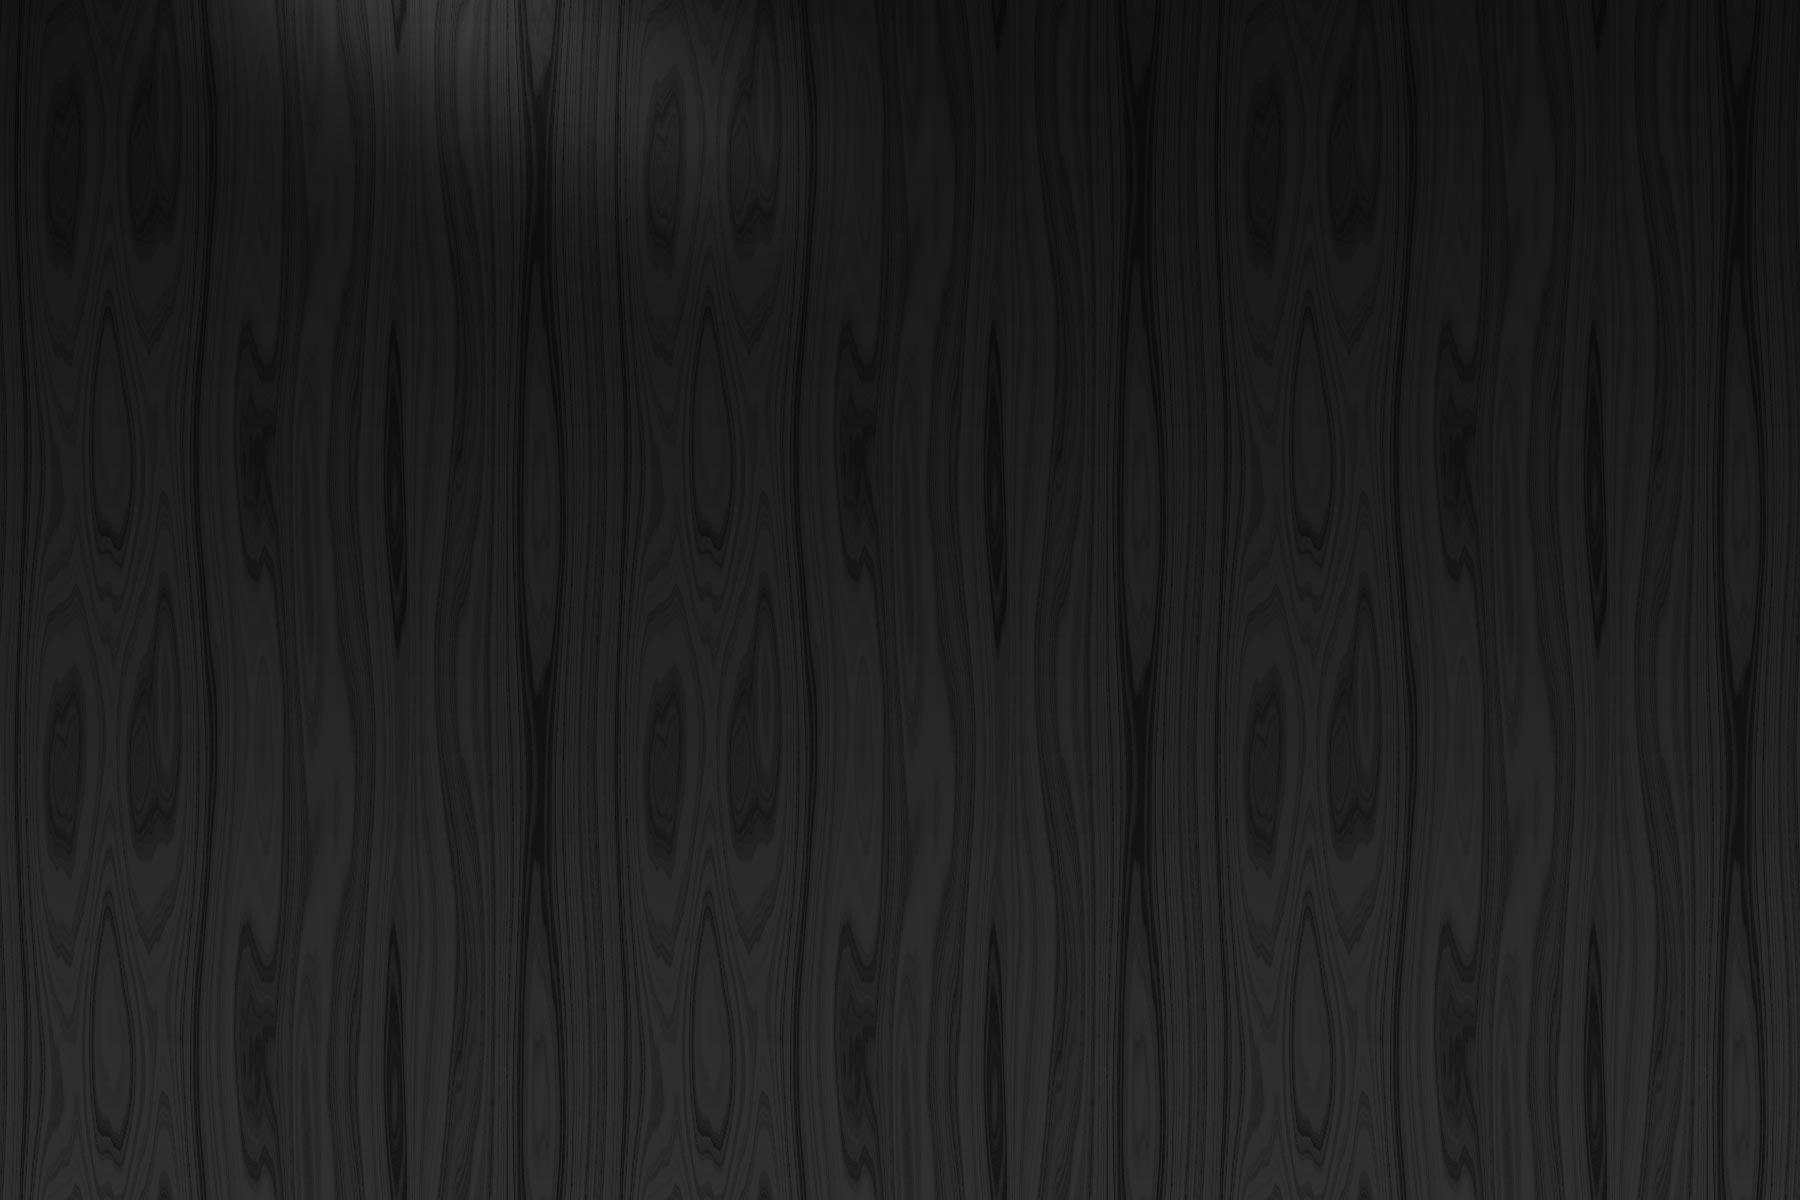 dark wood floor background. darkwoodbackgroundjpg dark wood floor background f